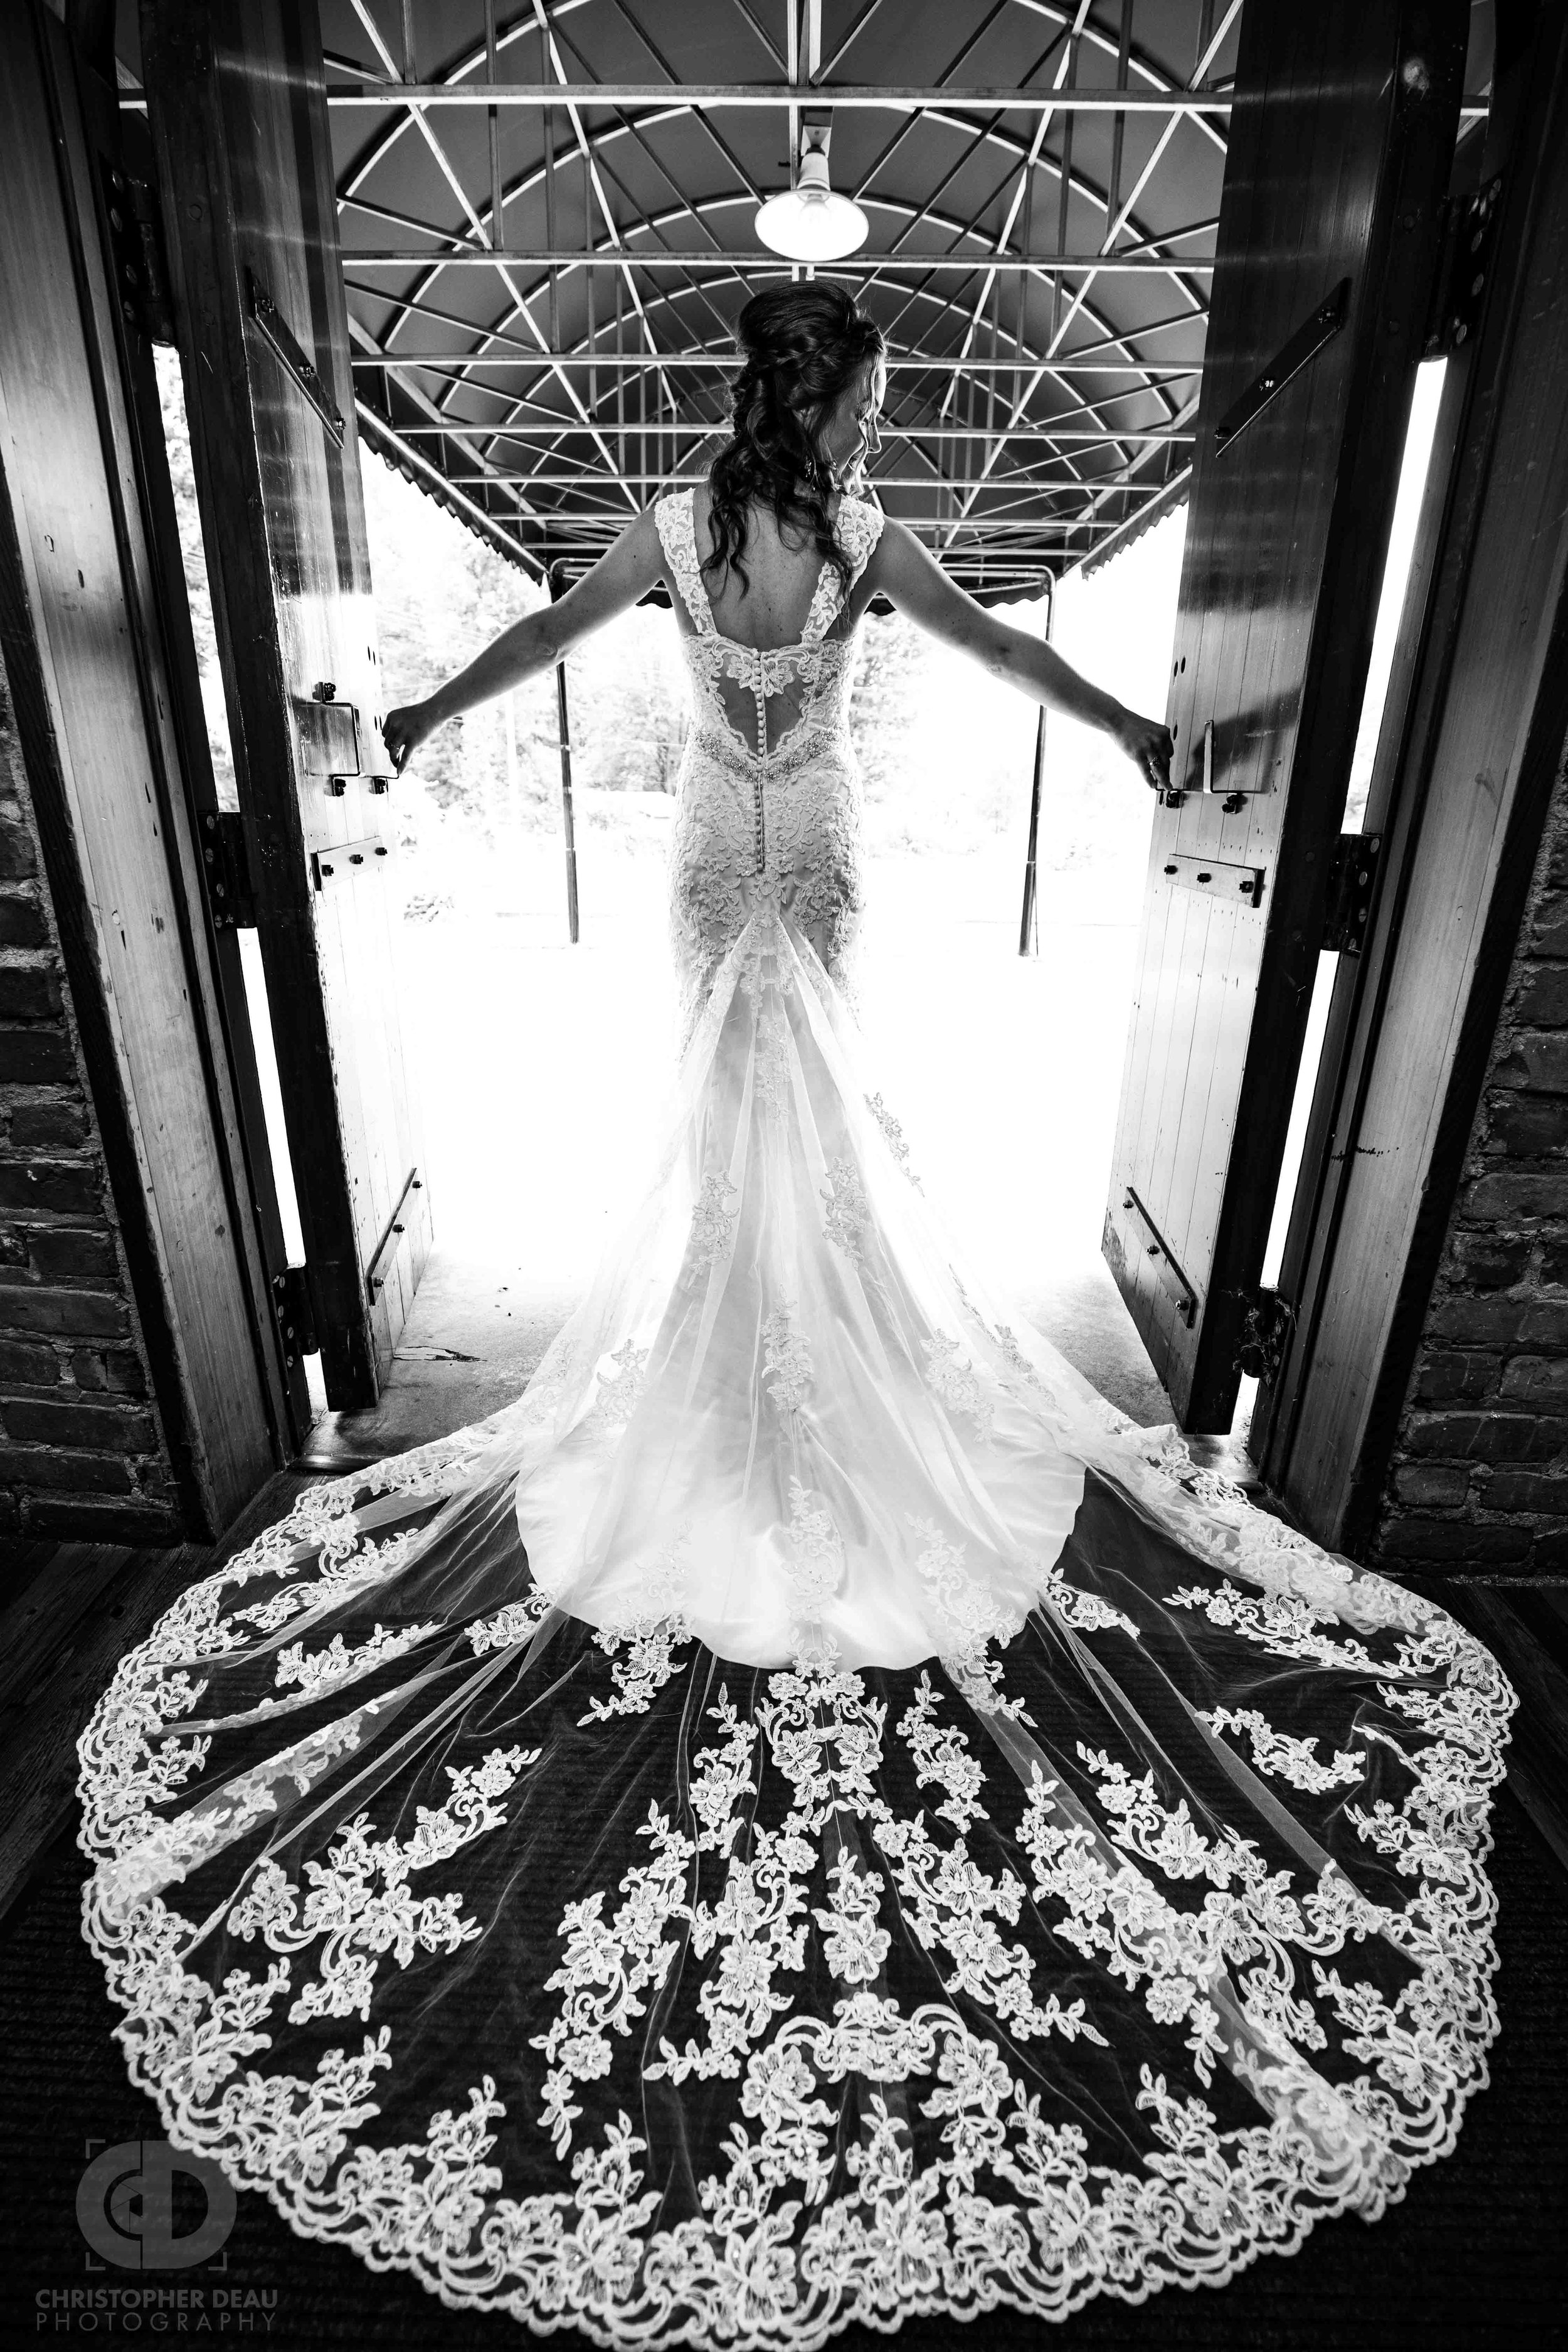 Stunning bride in flowing white lace dress standing in door way